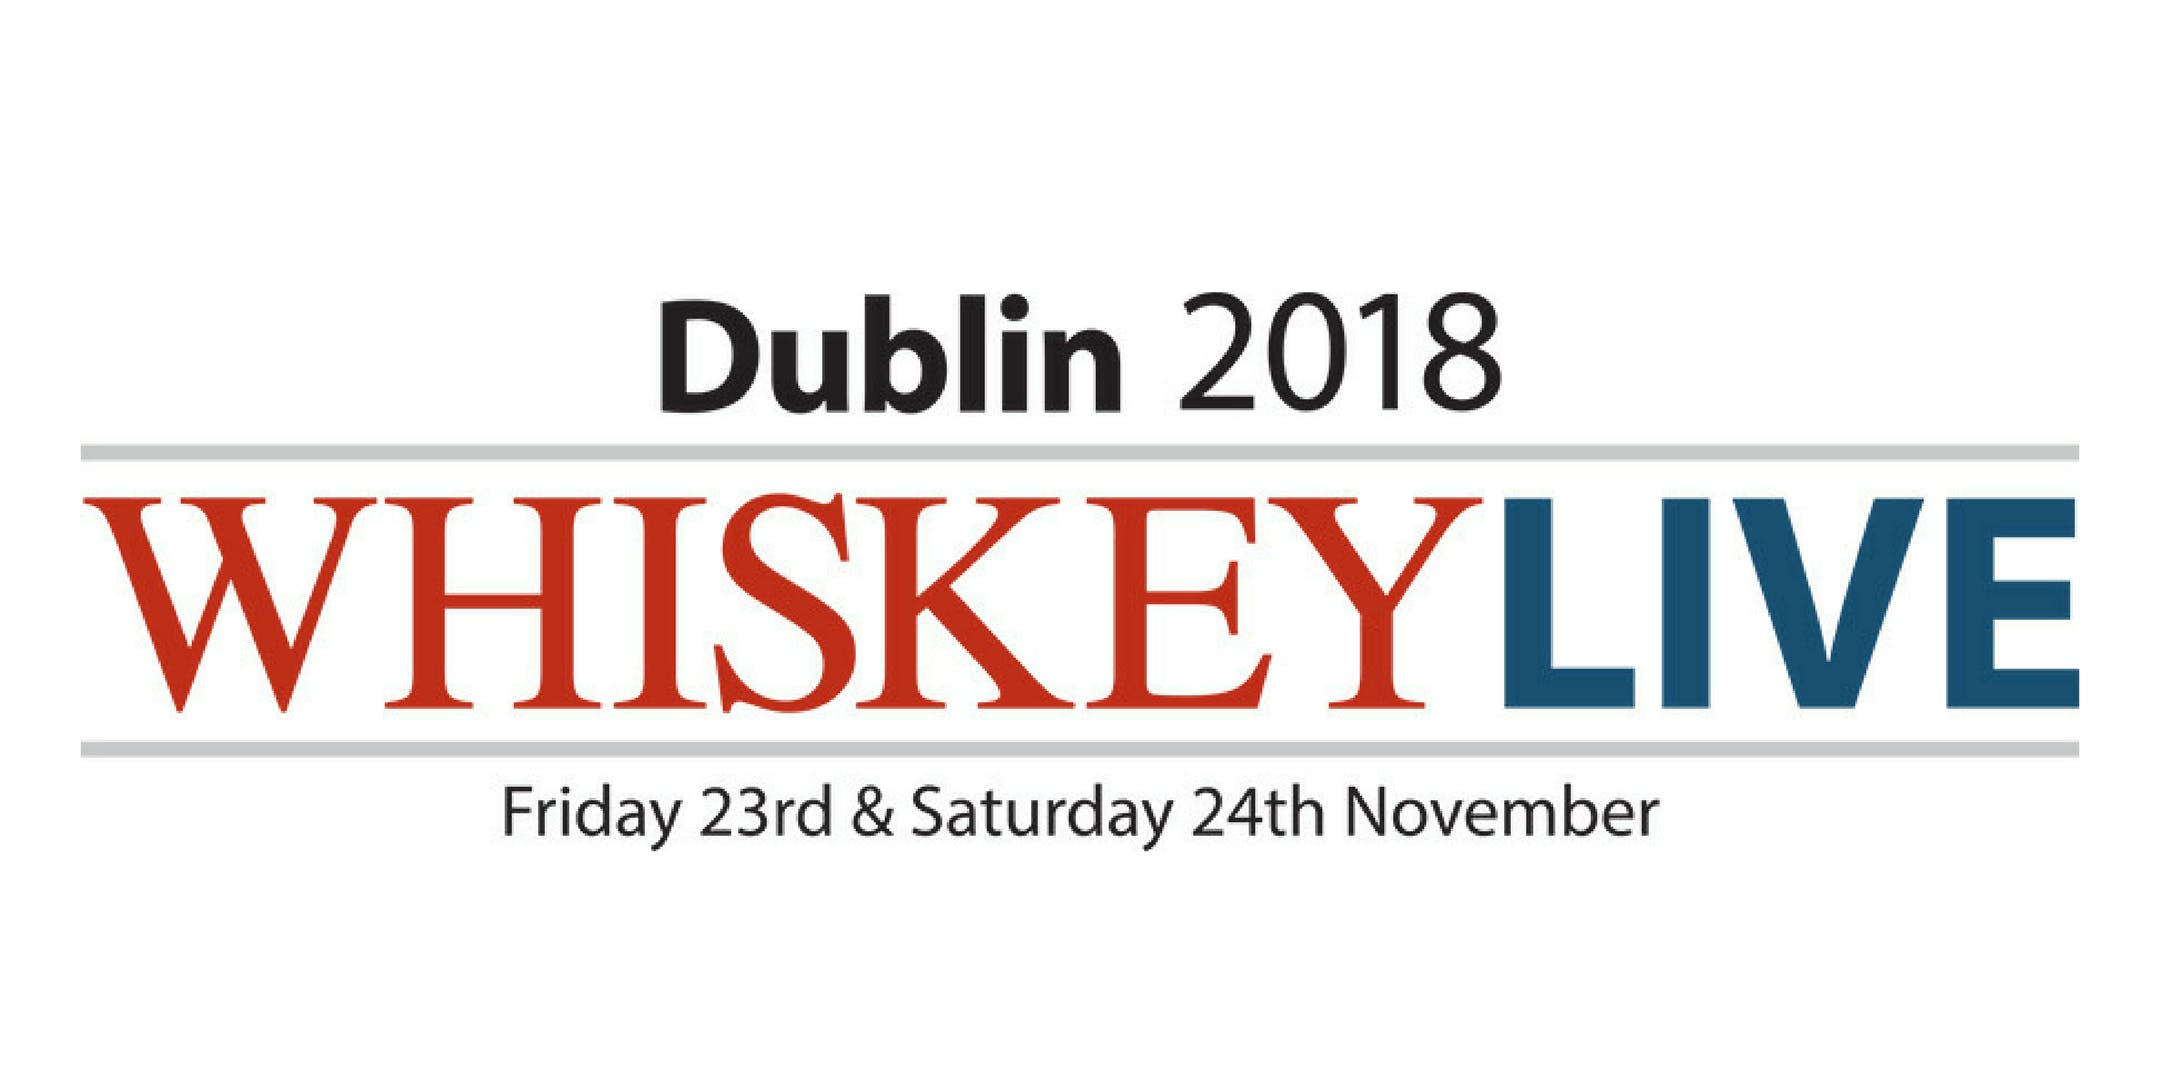 Whiskey Live Dublin 2018 - Saturday Session 5.30-9.00pm